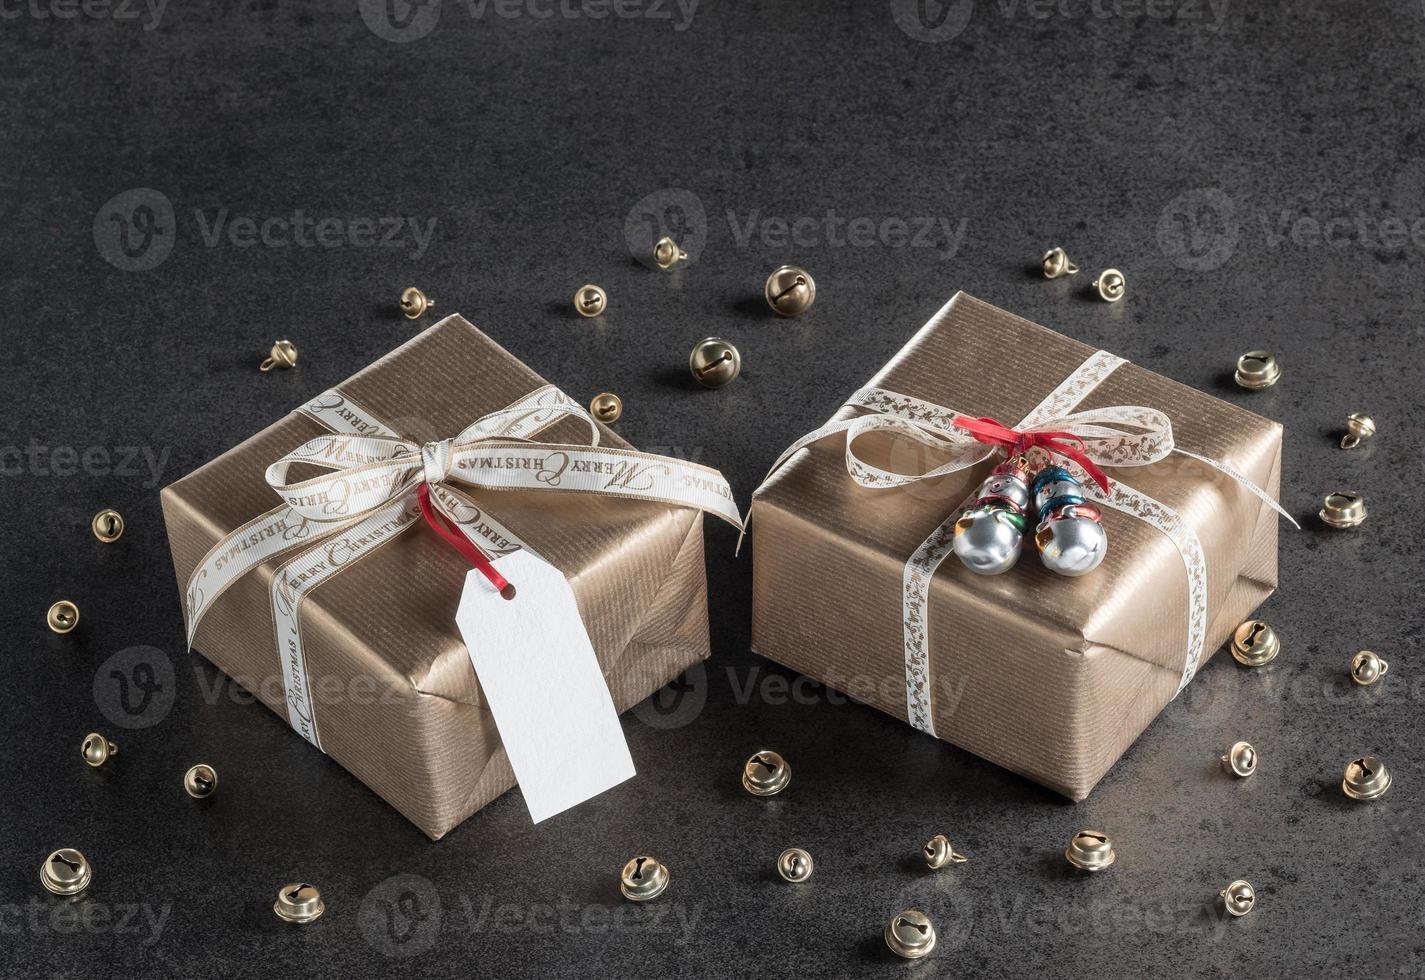 regali di Natale, etichetta regalo, decorazioni natalizie, pupazzi di neve foto